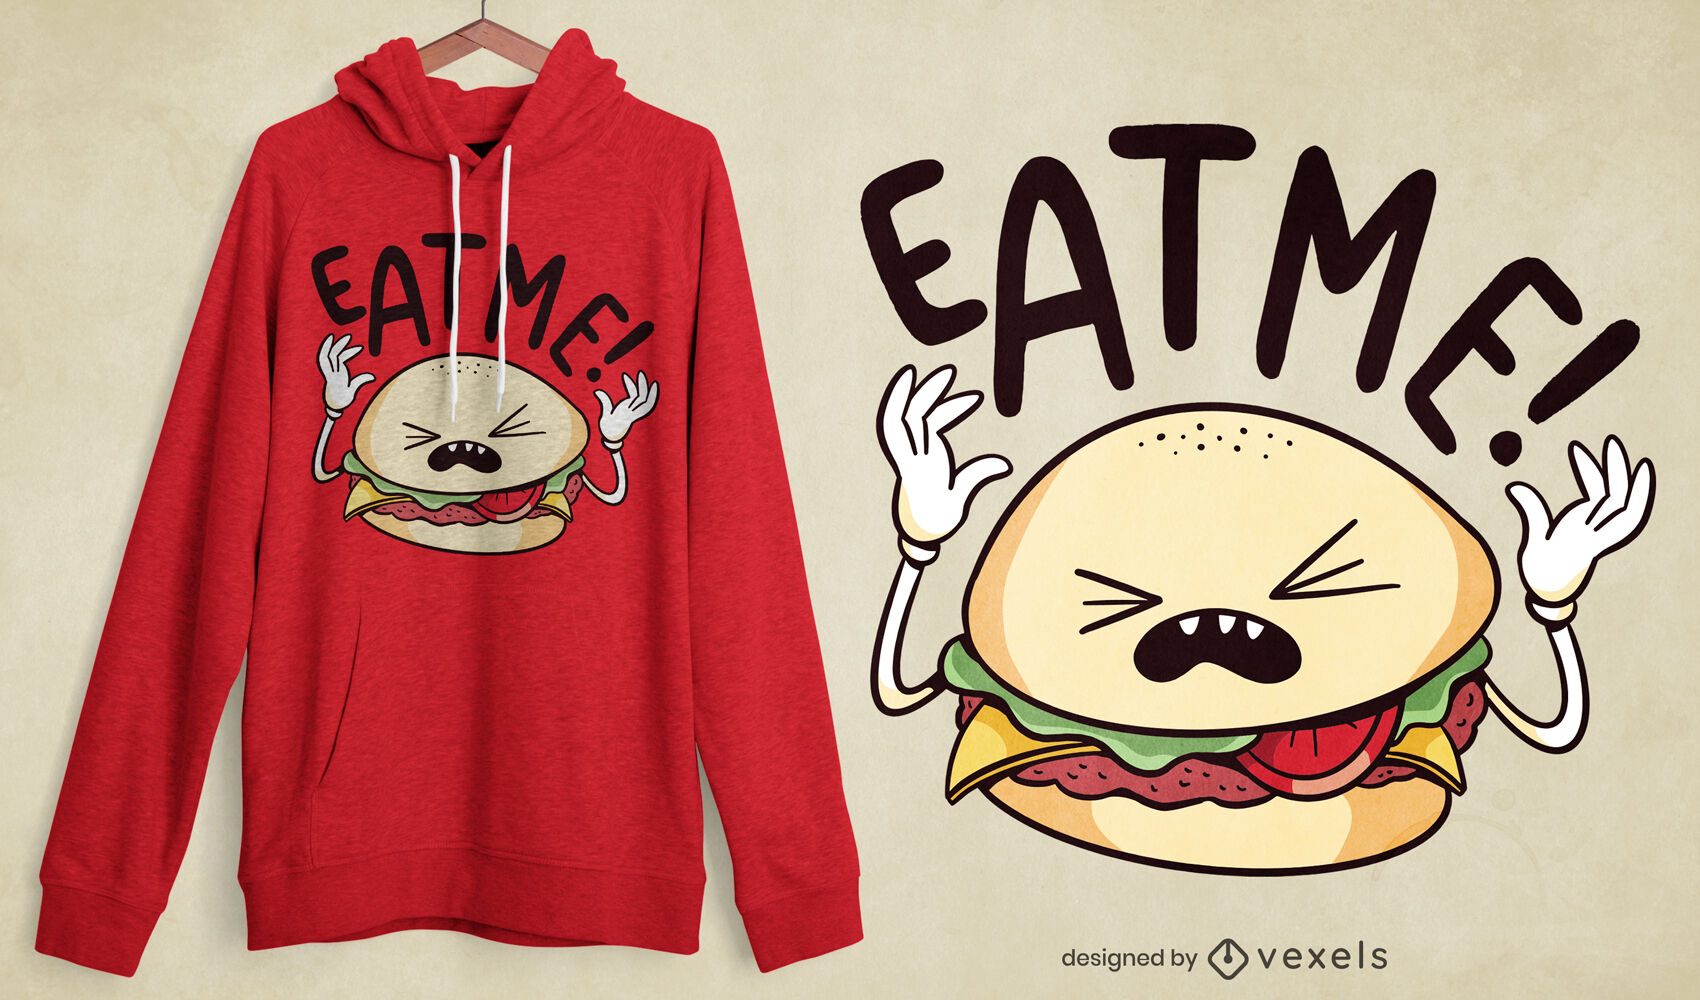 Eat me hamburger character t-shirt design